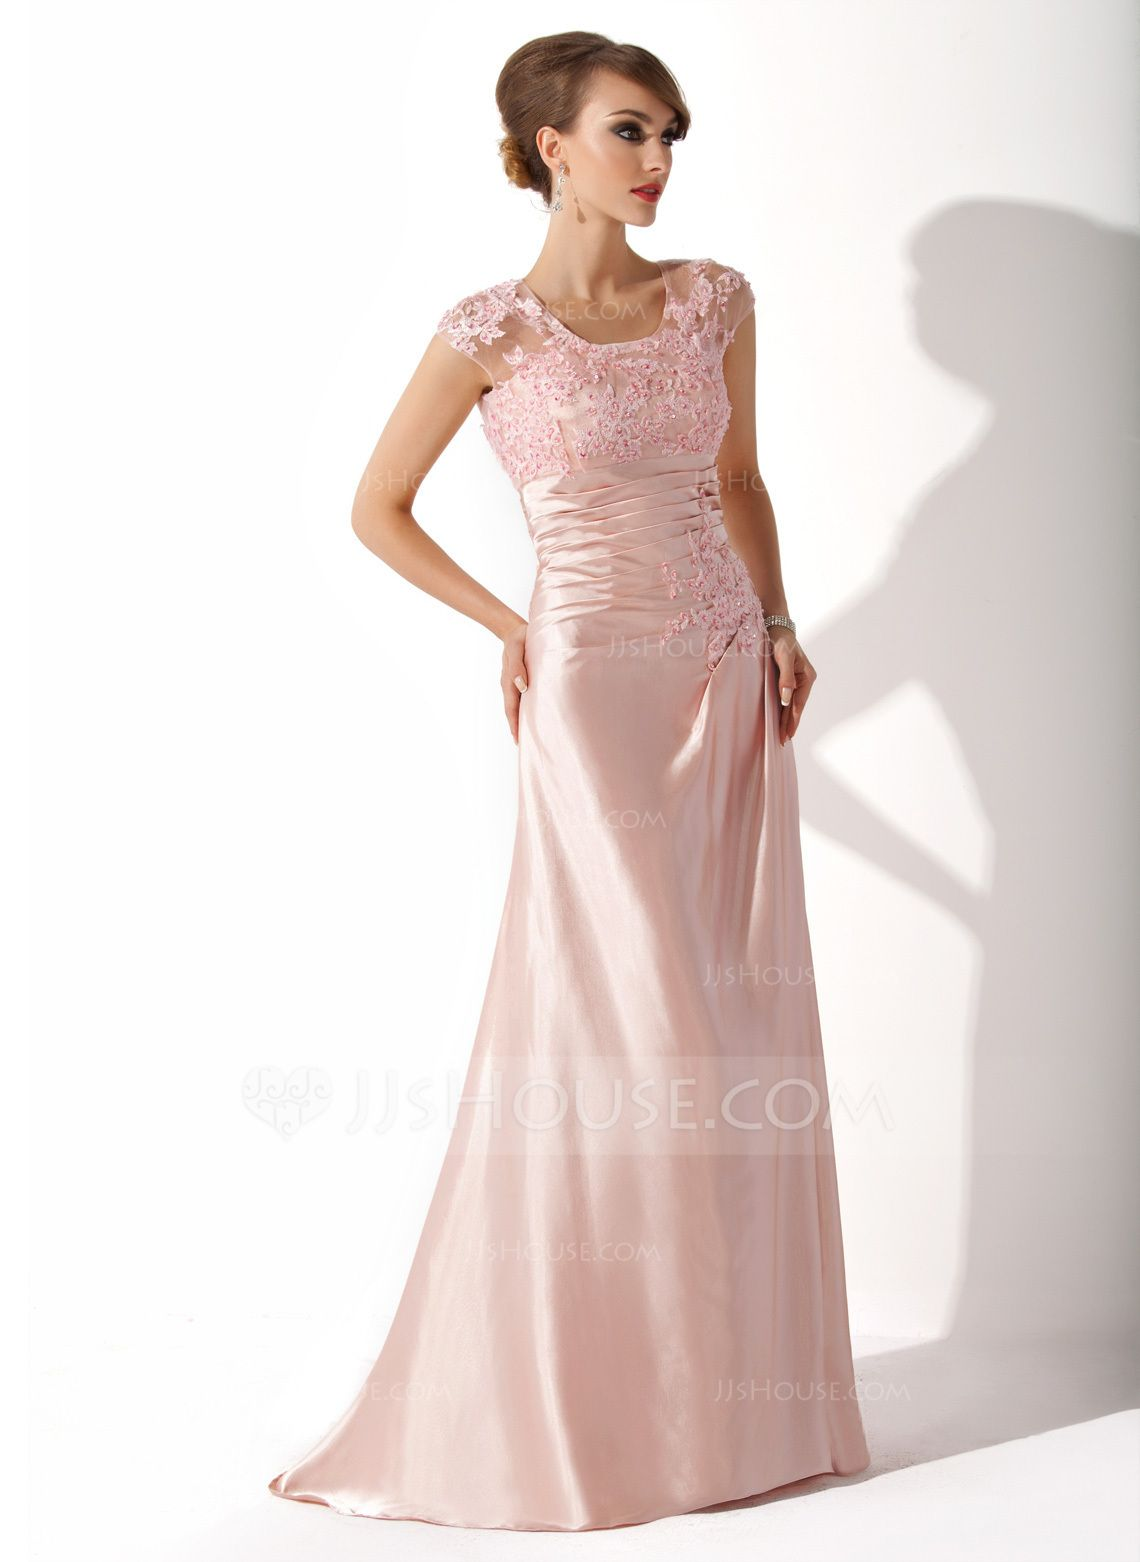 244f722b60abaa67f72ef5e0233a3cf5.jpg (1140×1562) | dress | Pinterest ...